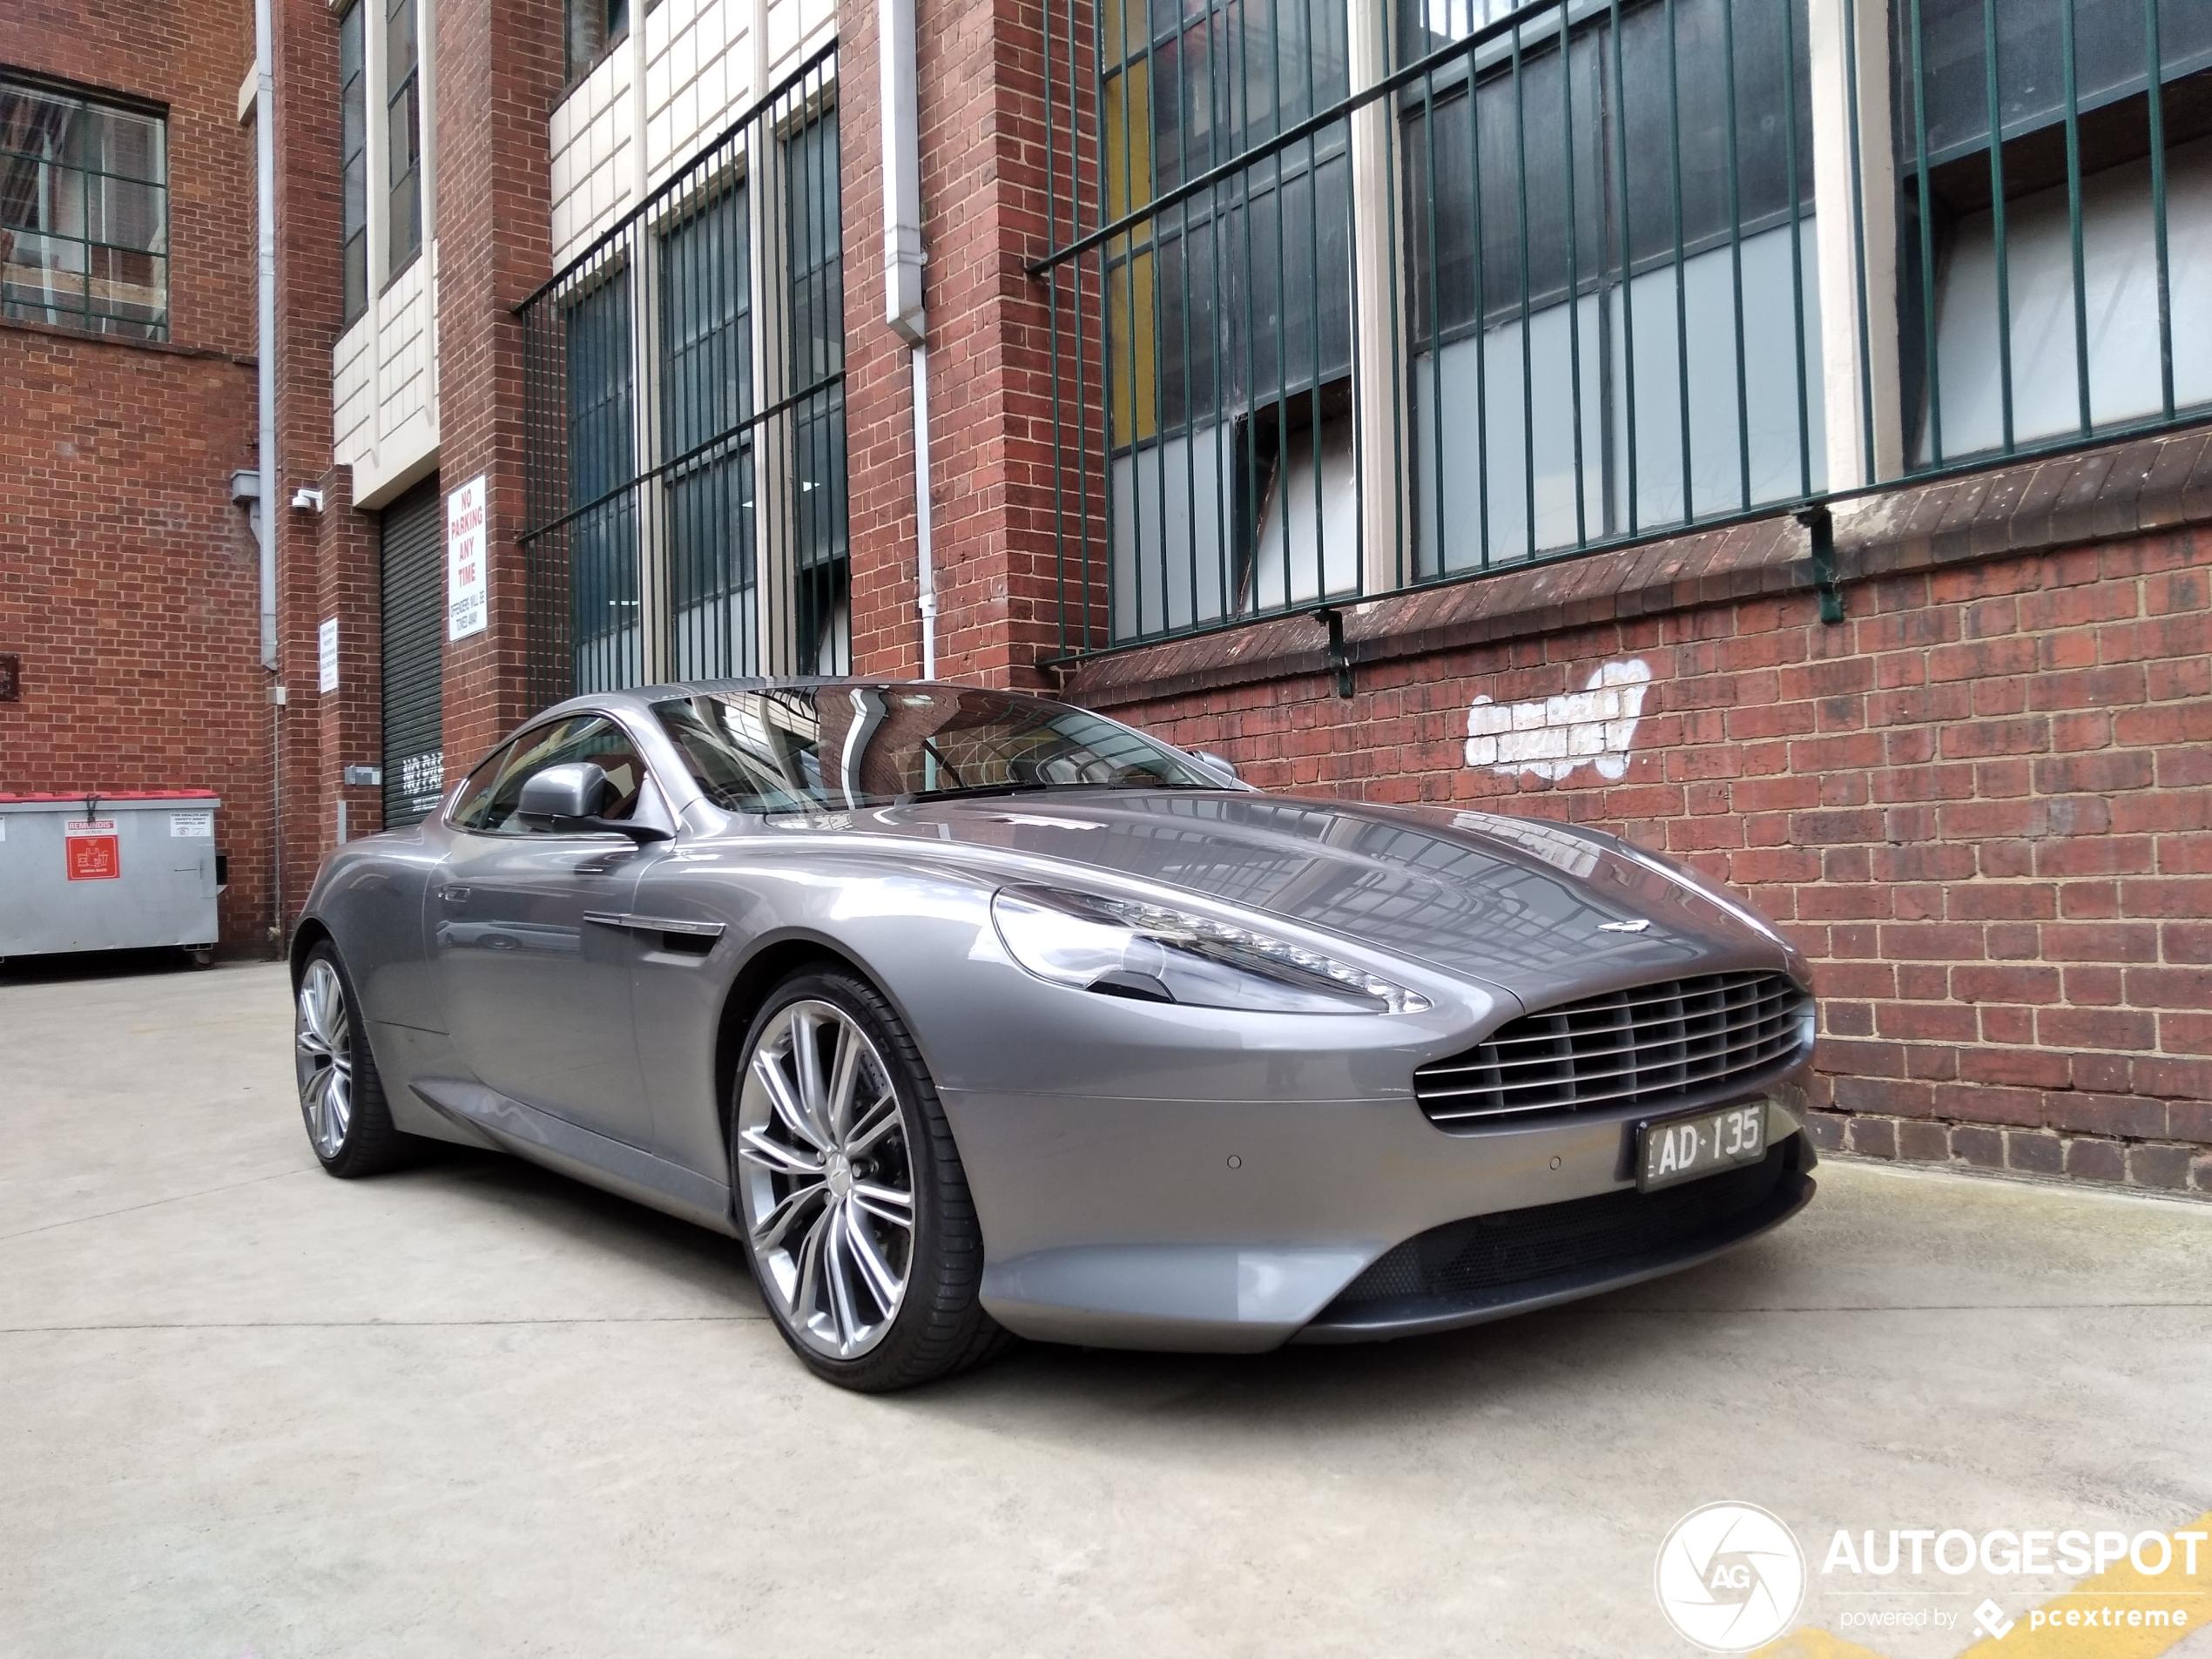 Is de Aston Martin Virage meest onbekende Aston Martin?